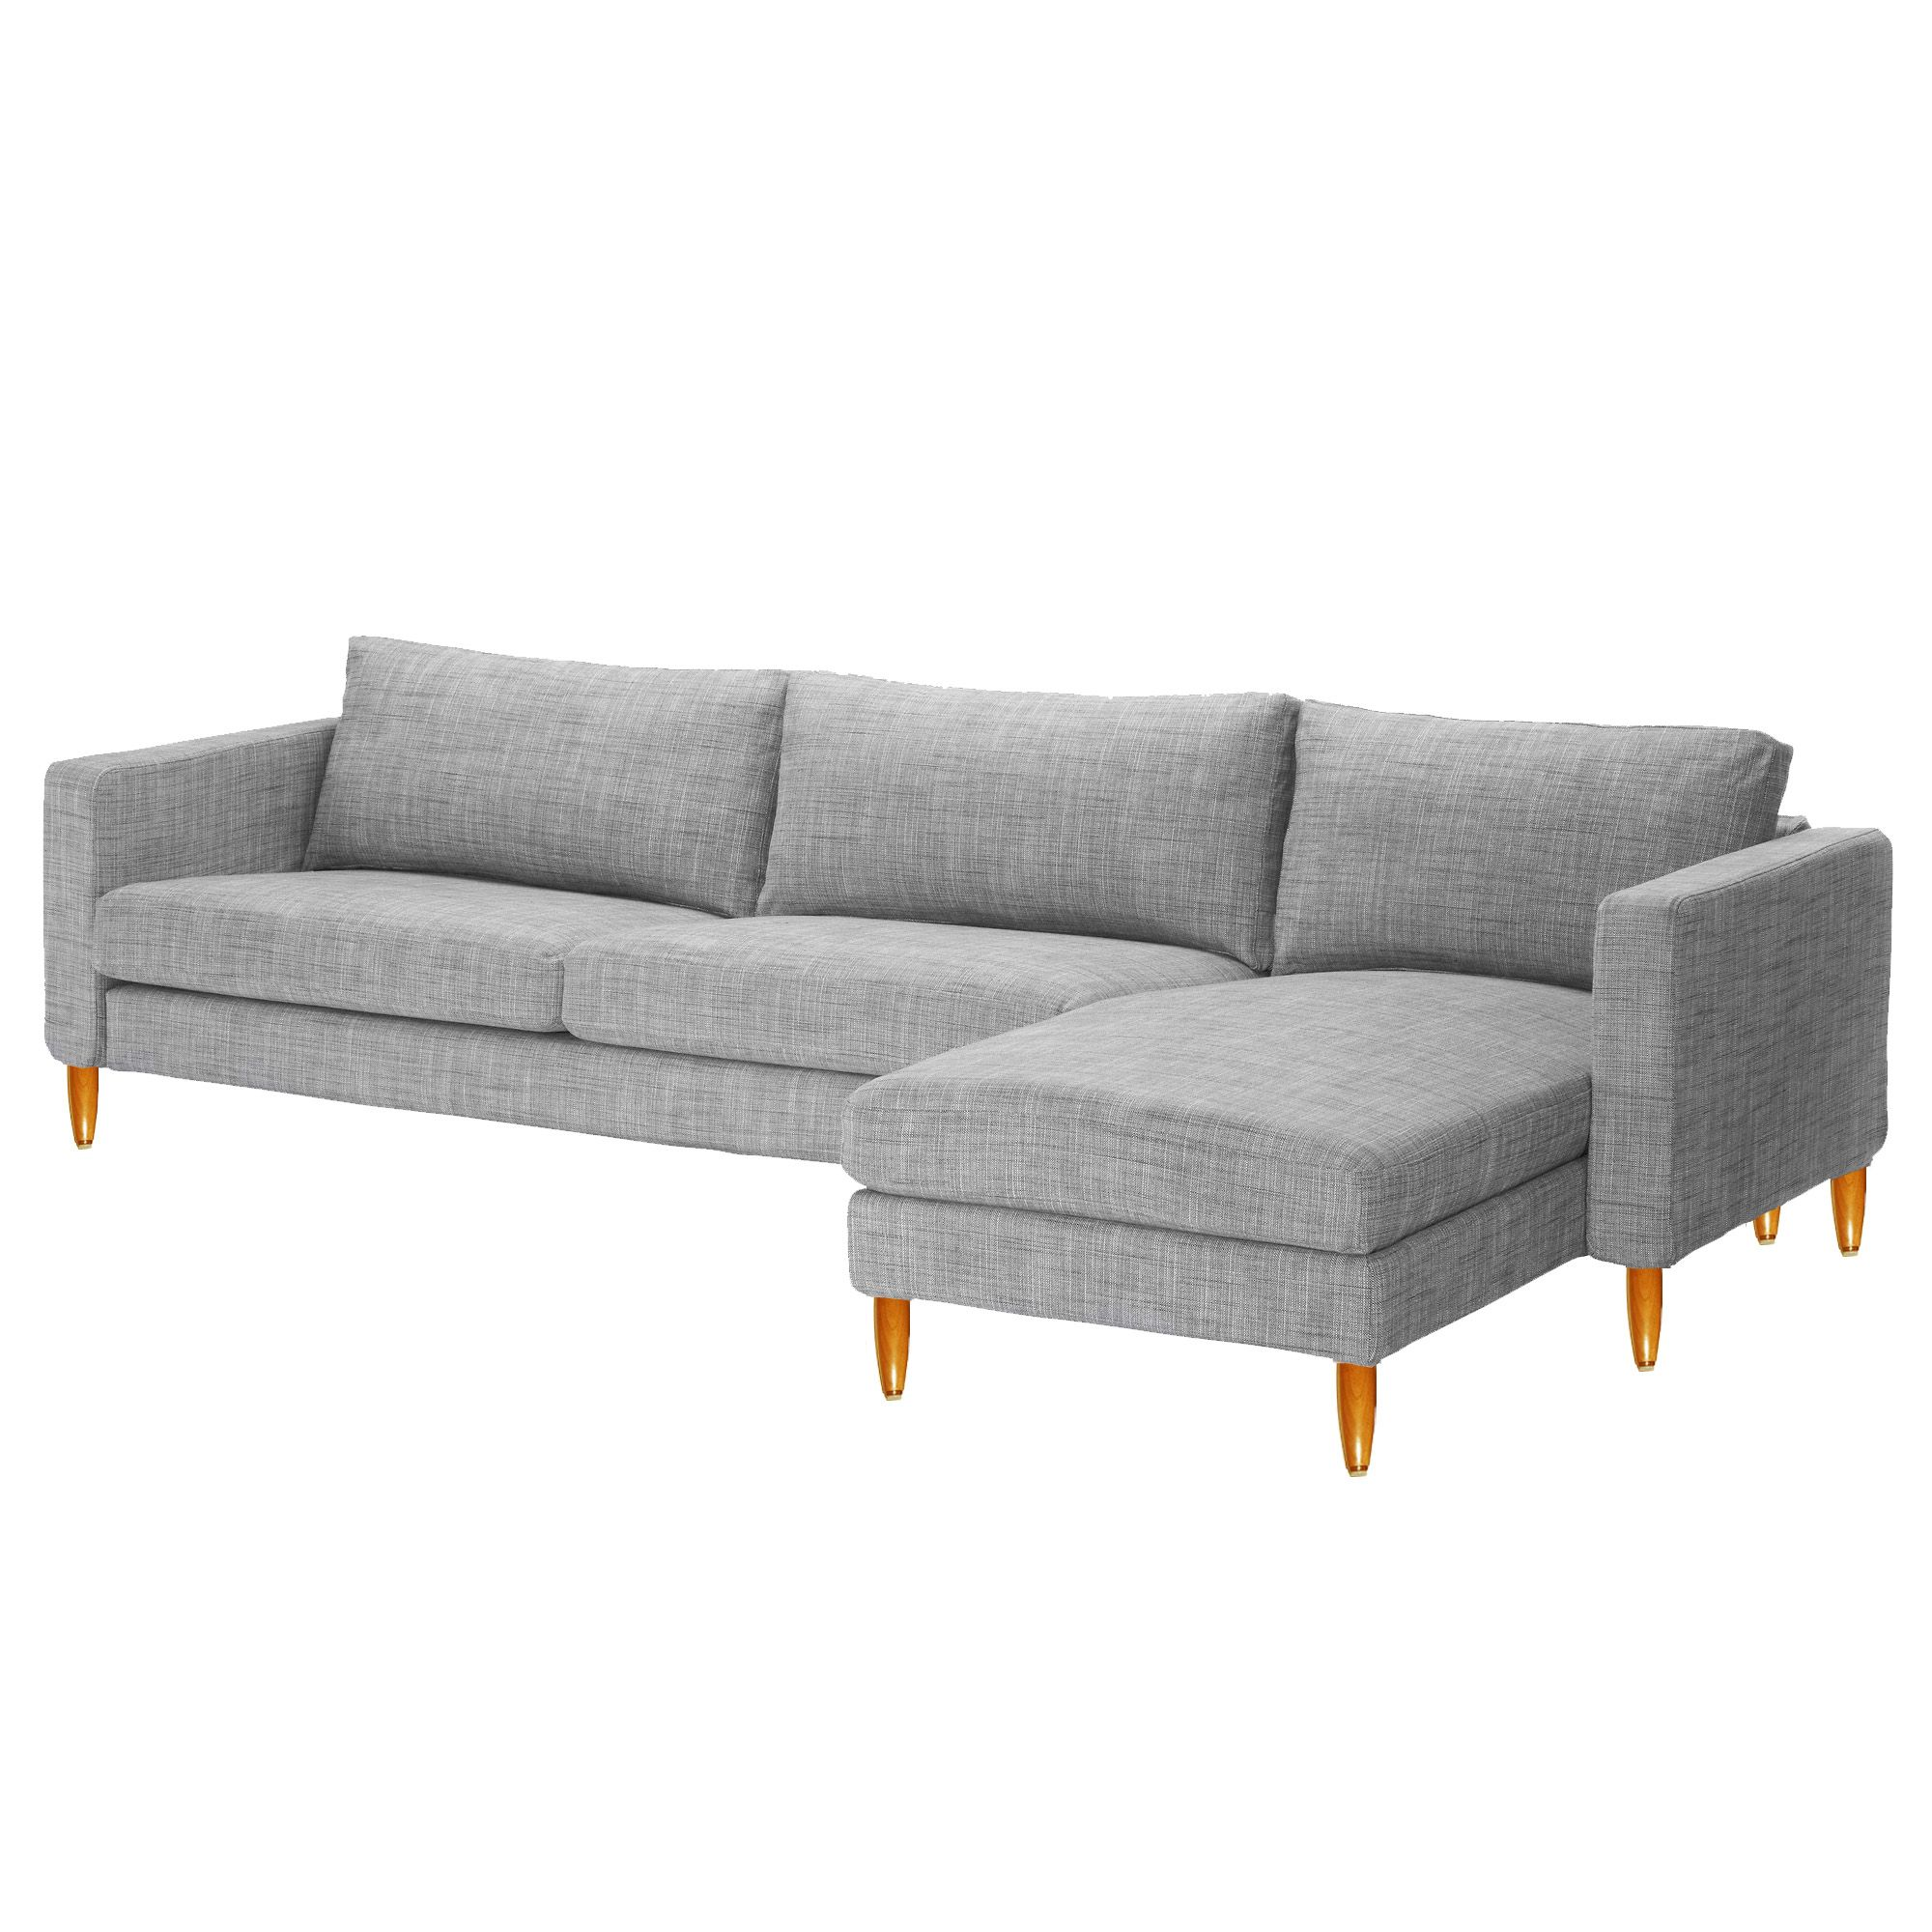 karlstad sofa blekinge white vine tufted ikea 43 chaise with new legs 610 total